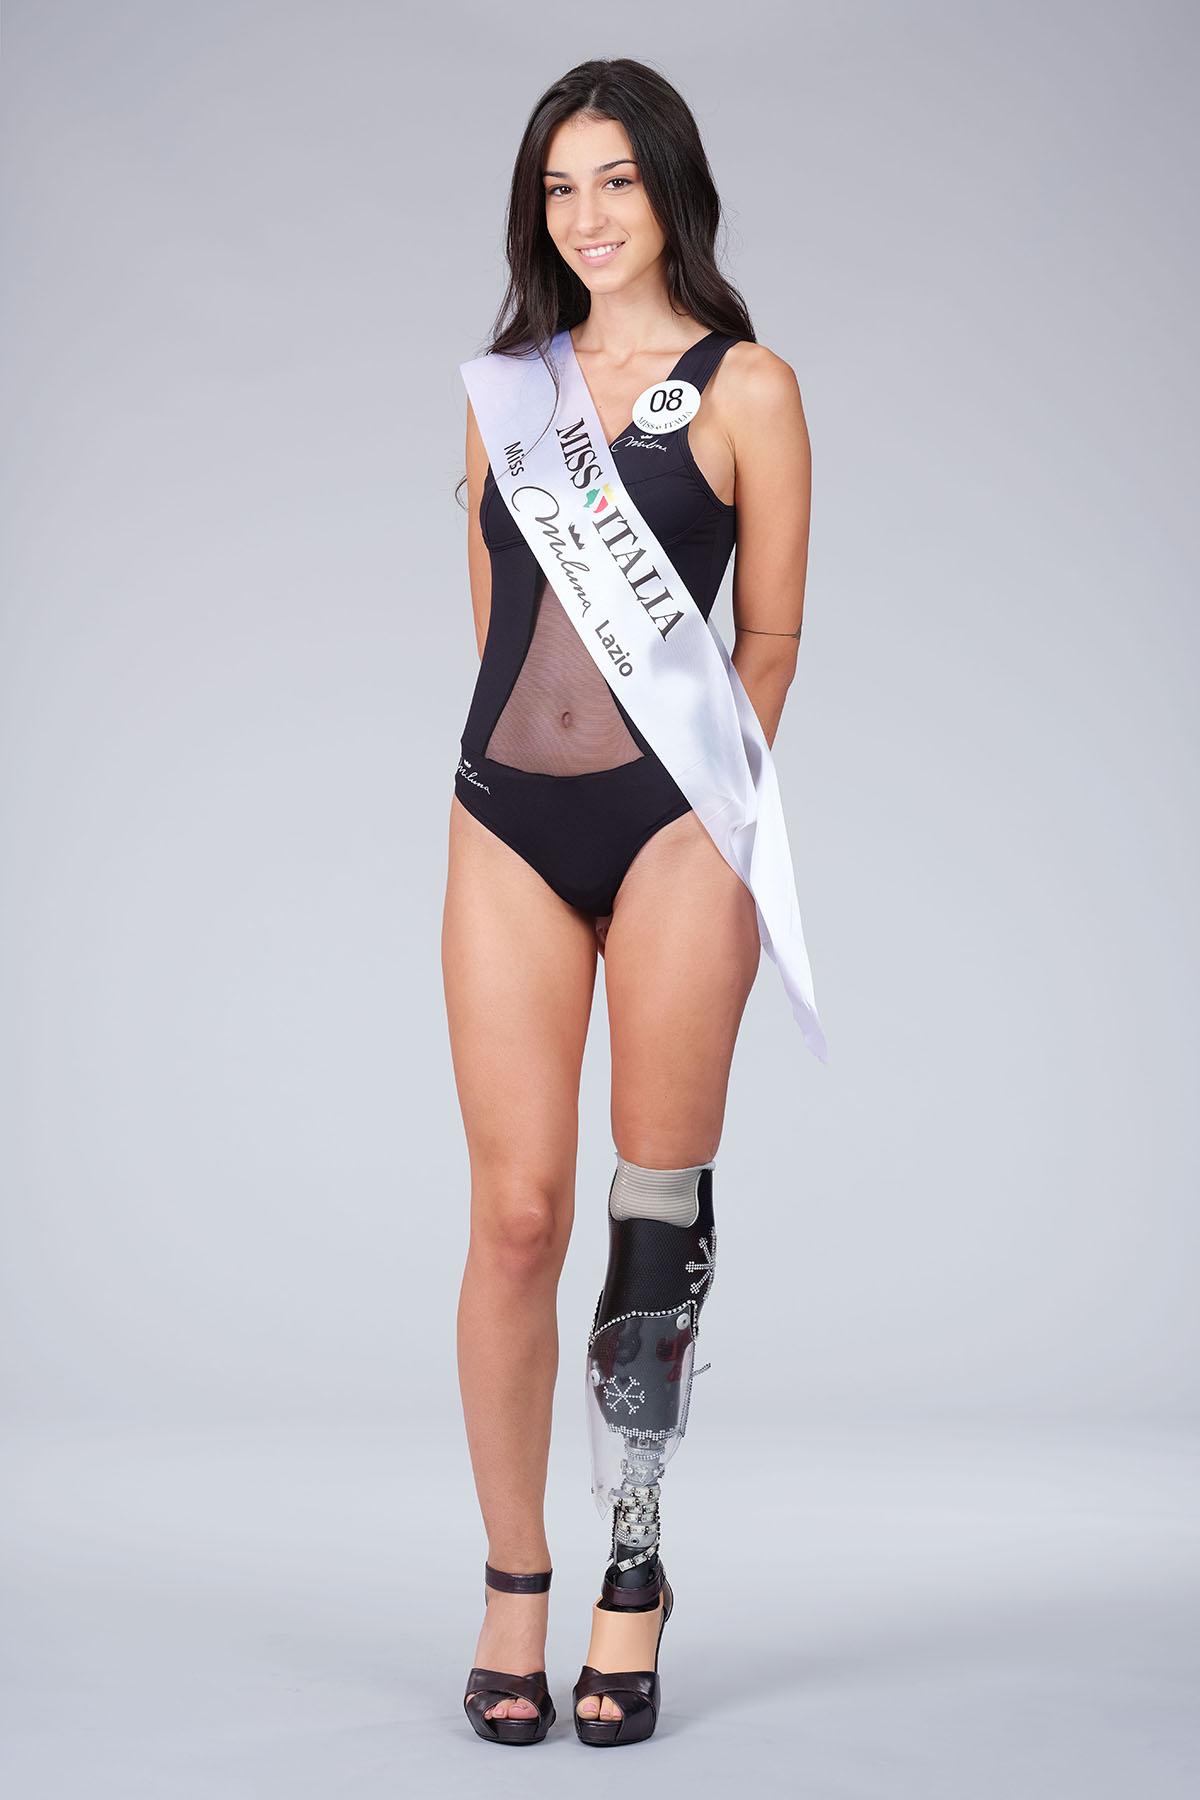 08-Chiara-Bordi-Miss-Miluna-Lazio-2018 (1).jpg